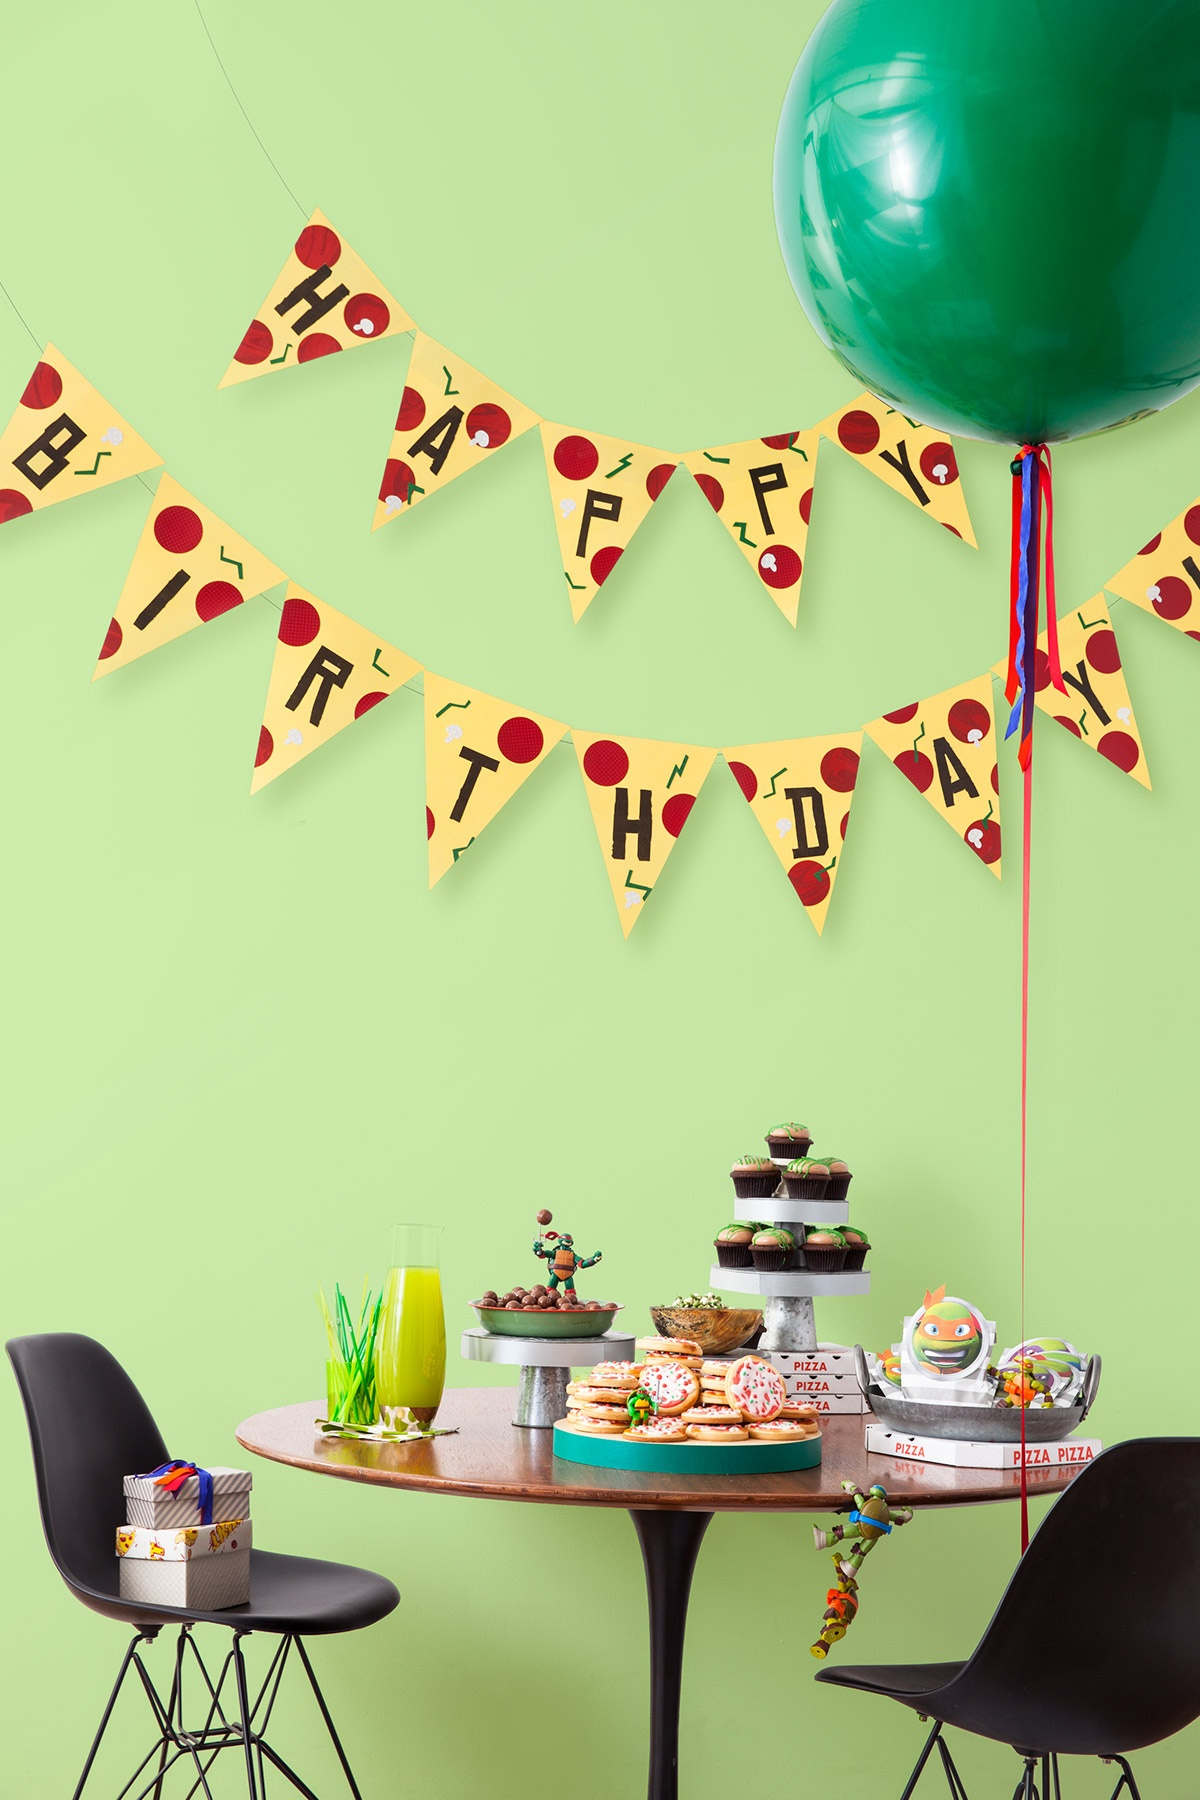 Tmnt Printable Pizza Pendant Birthday Banner | Nickelodeon Parents - Free Printable Ninja Turtle Birthday Banner